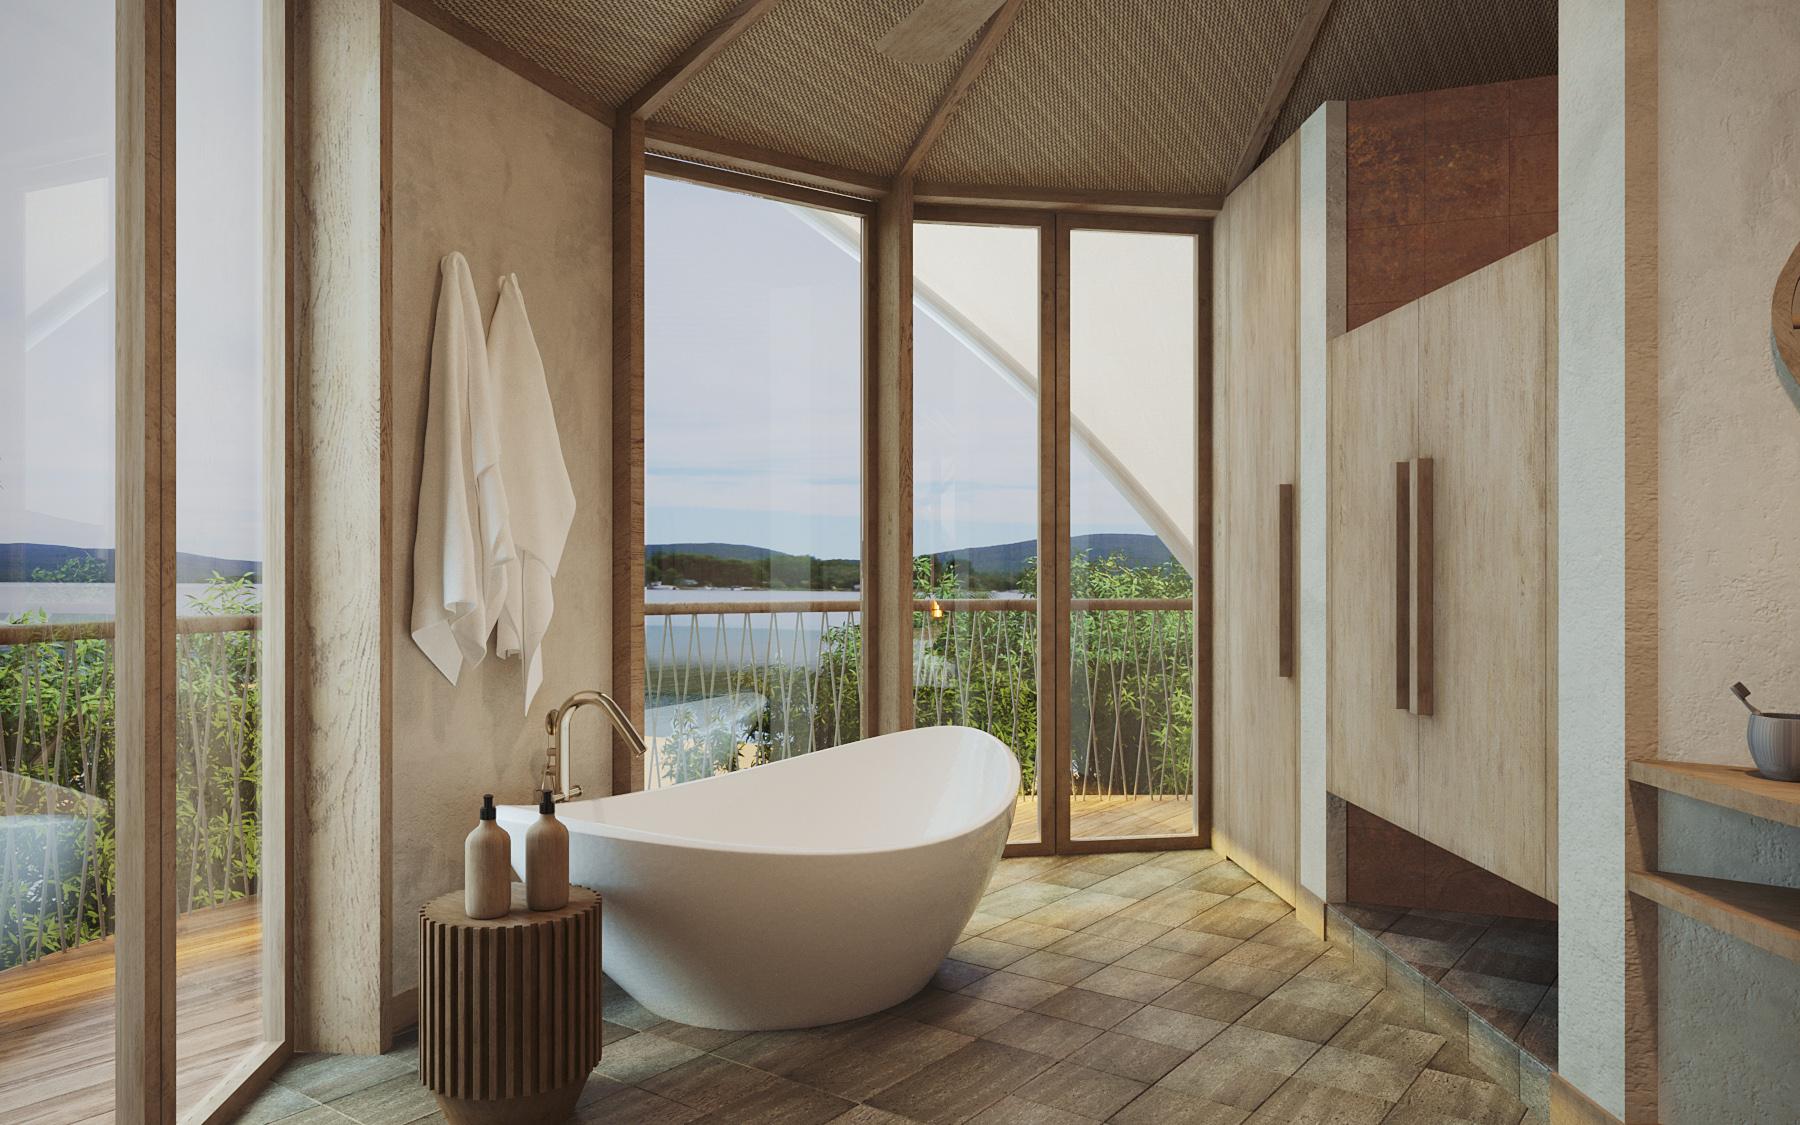 lodge-bathroom-experience-luxury-hospitality